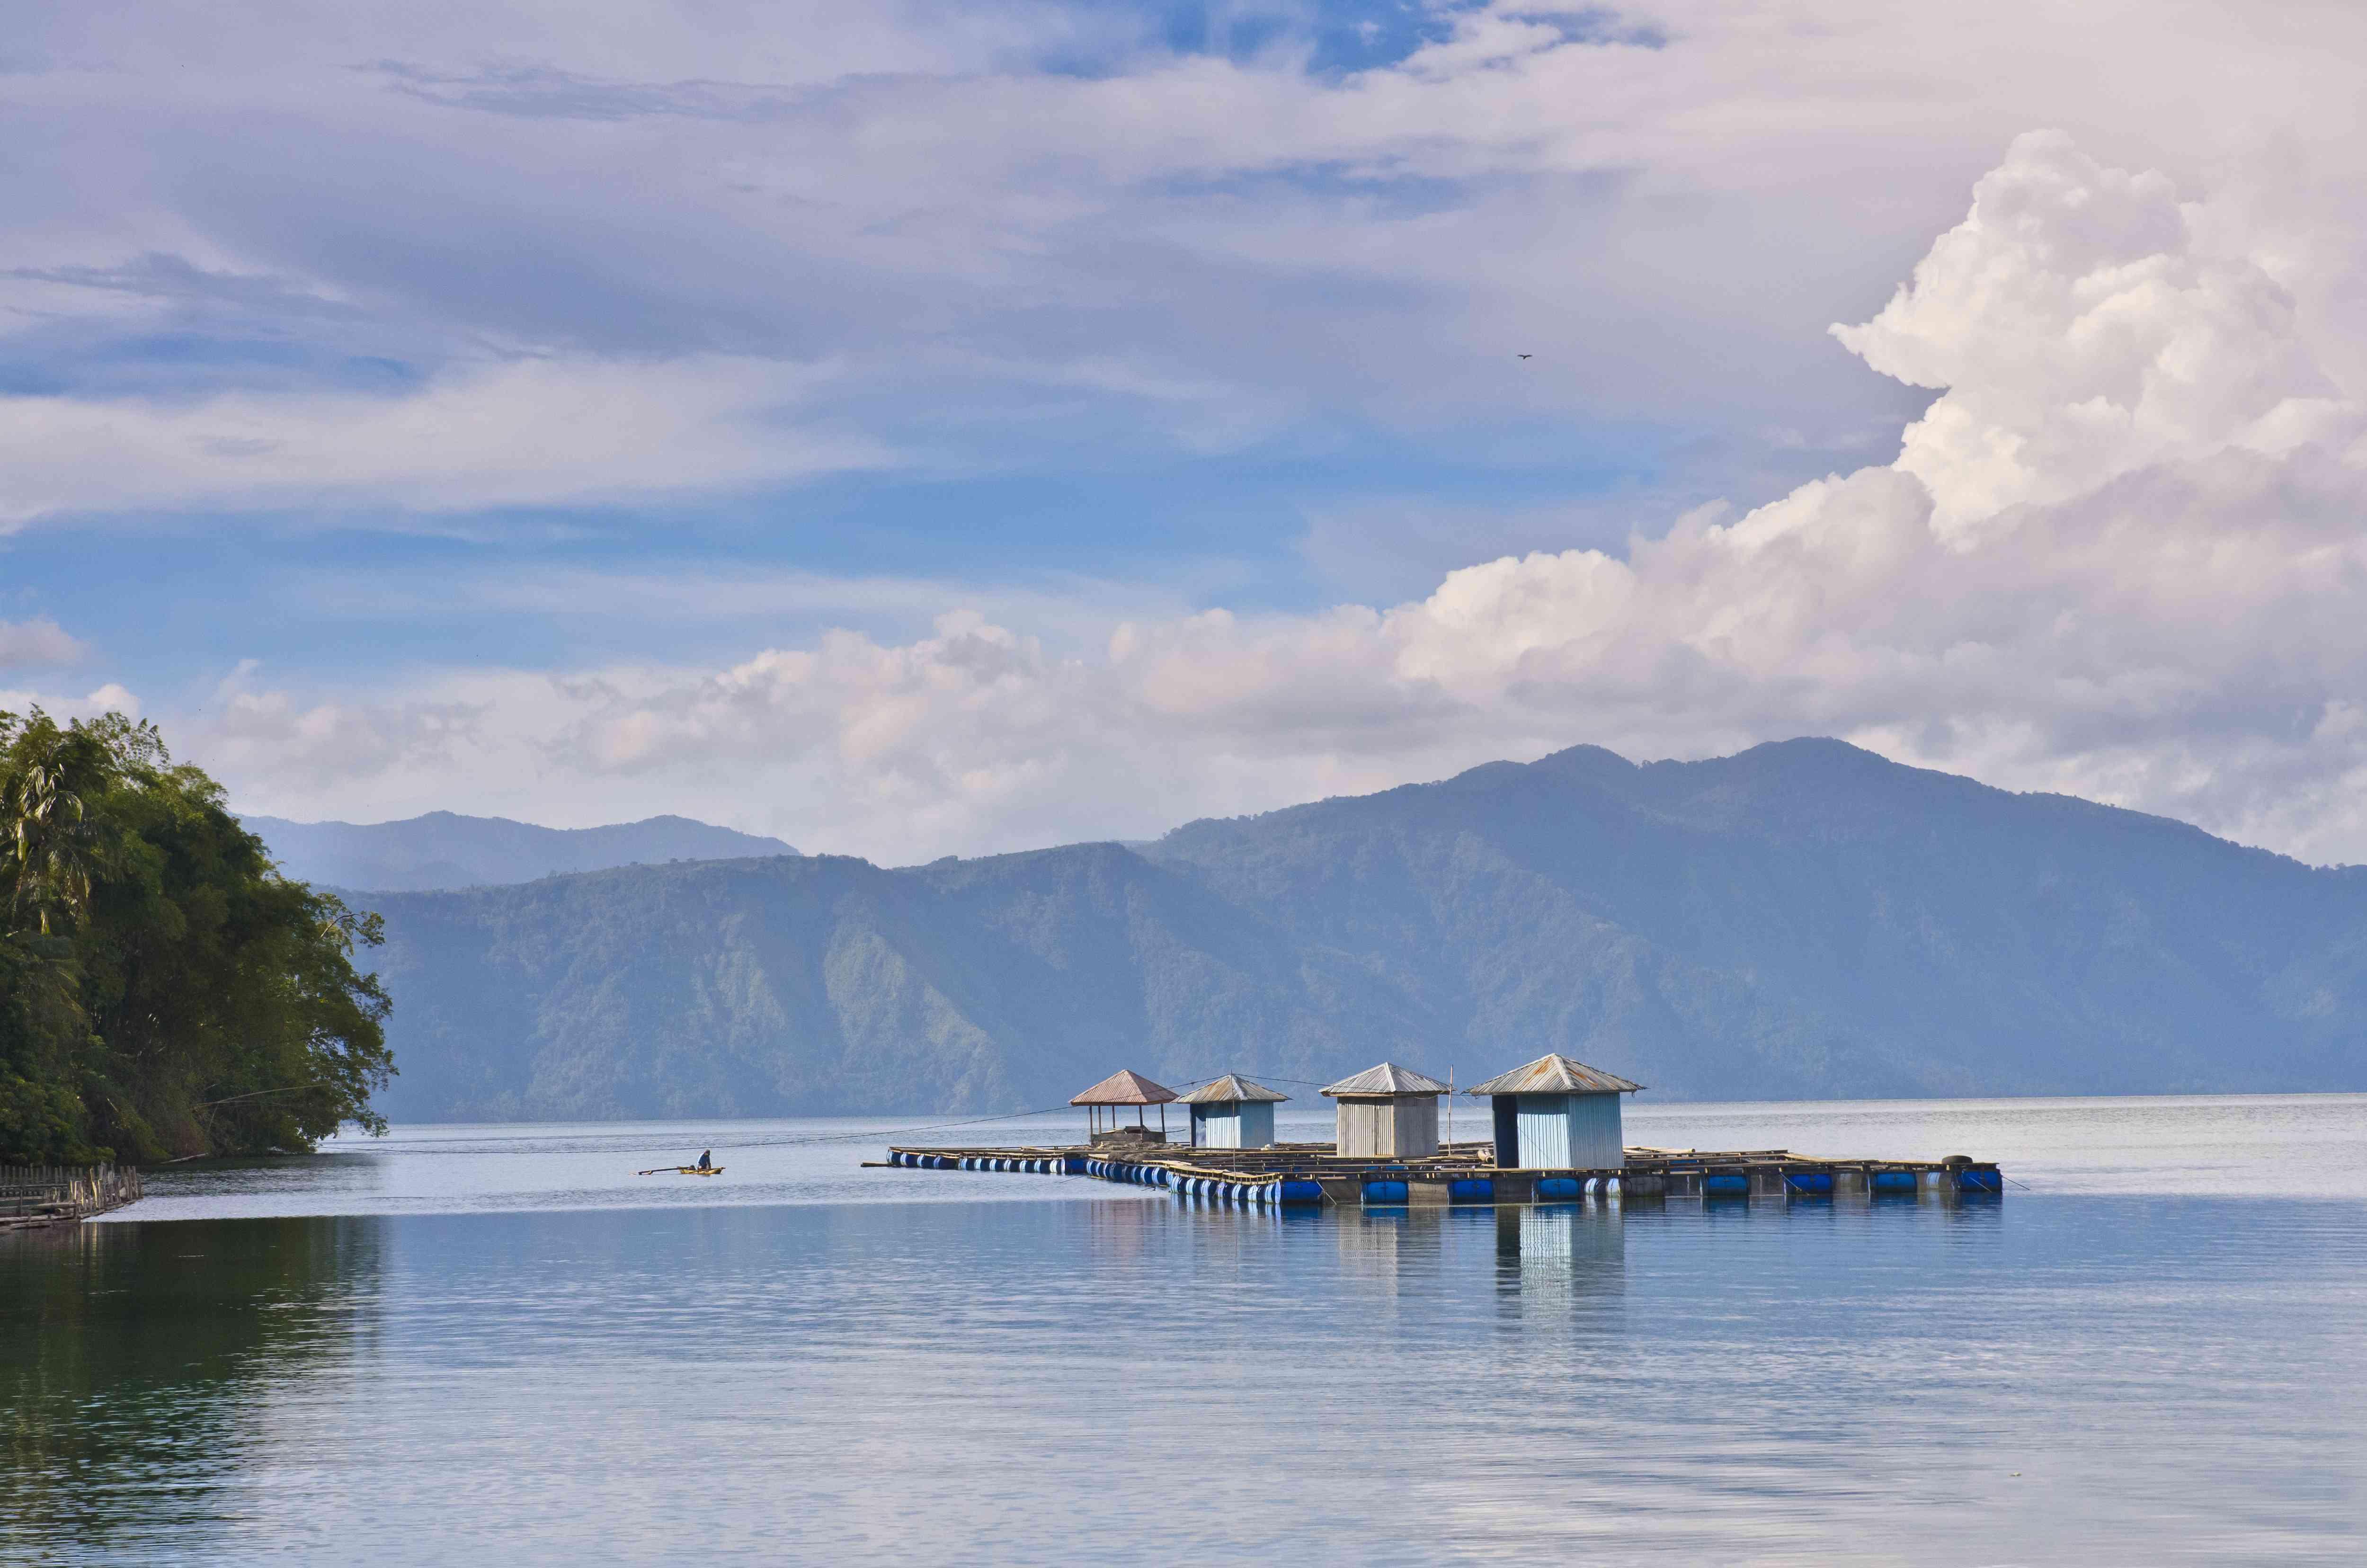 Fishing platforms at Lake Ranau in South Sumatra, Indonesia